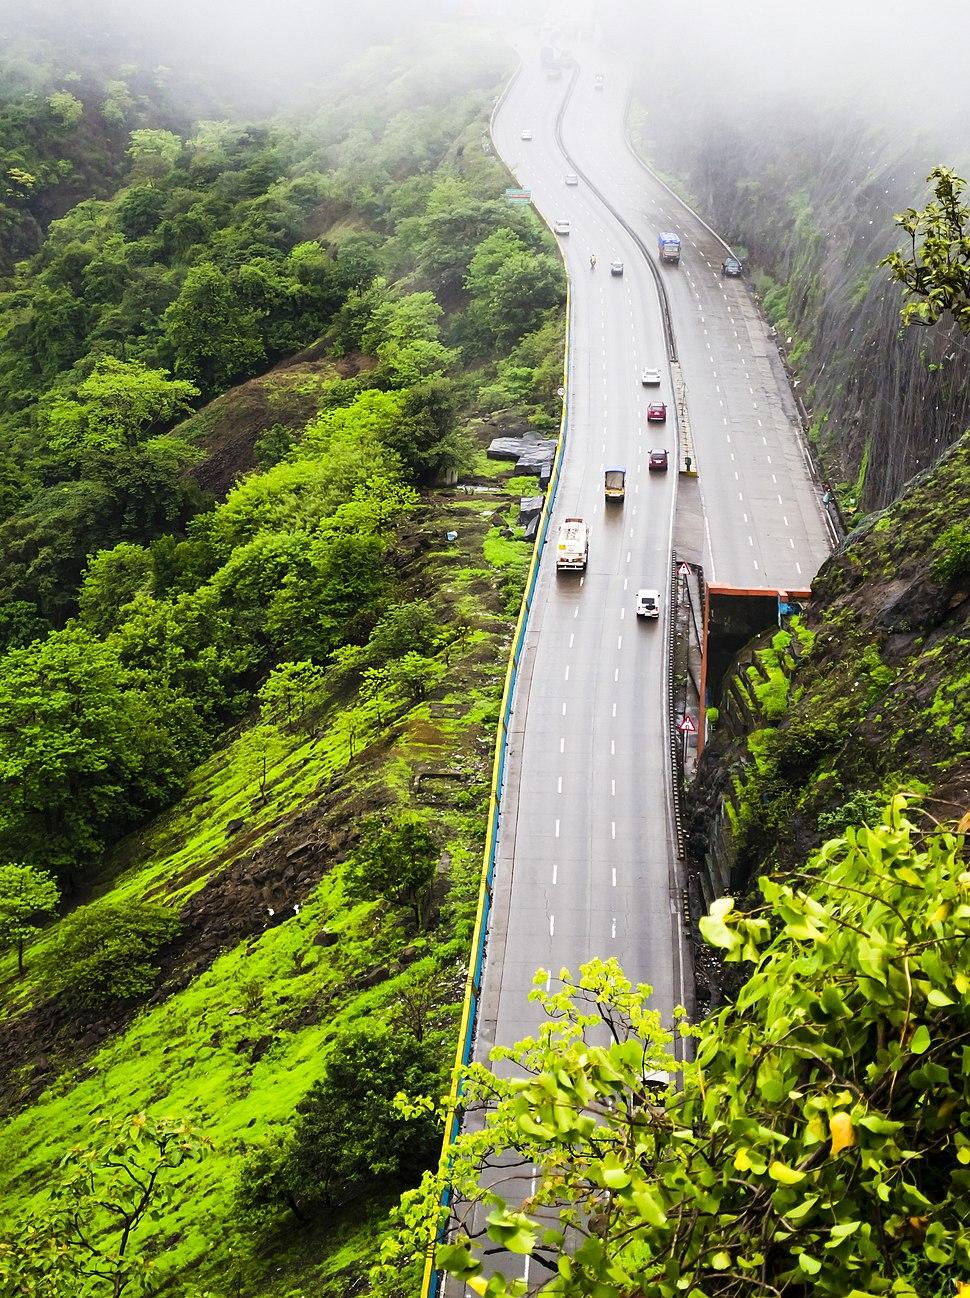 Mumbai-Pune Expressway from Rajmachi Garden, Khandala